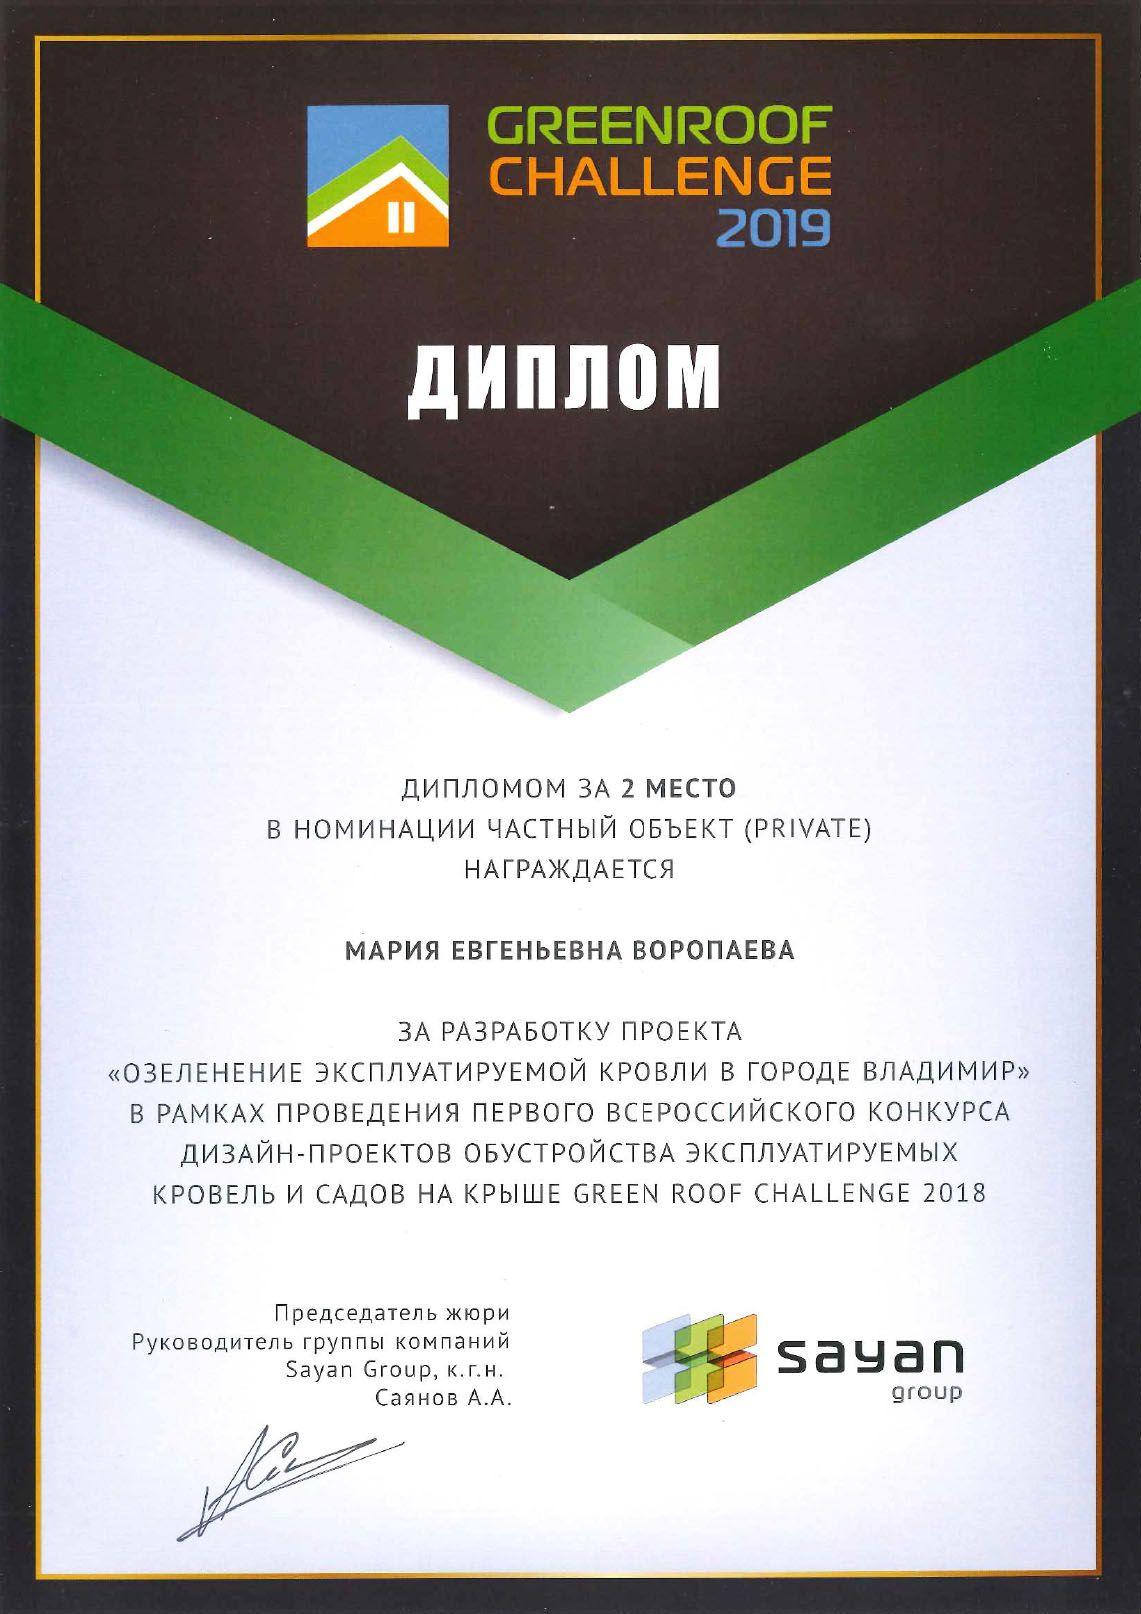 <a href='https://archreforma.ru/publikaciiinagrady/greenroof-challenge-2019-diplom/'>Посмотреть подробнее... 'Greenroof Challenge 2019 диплом</a>